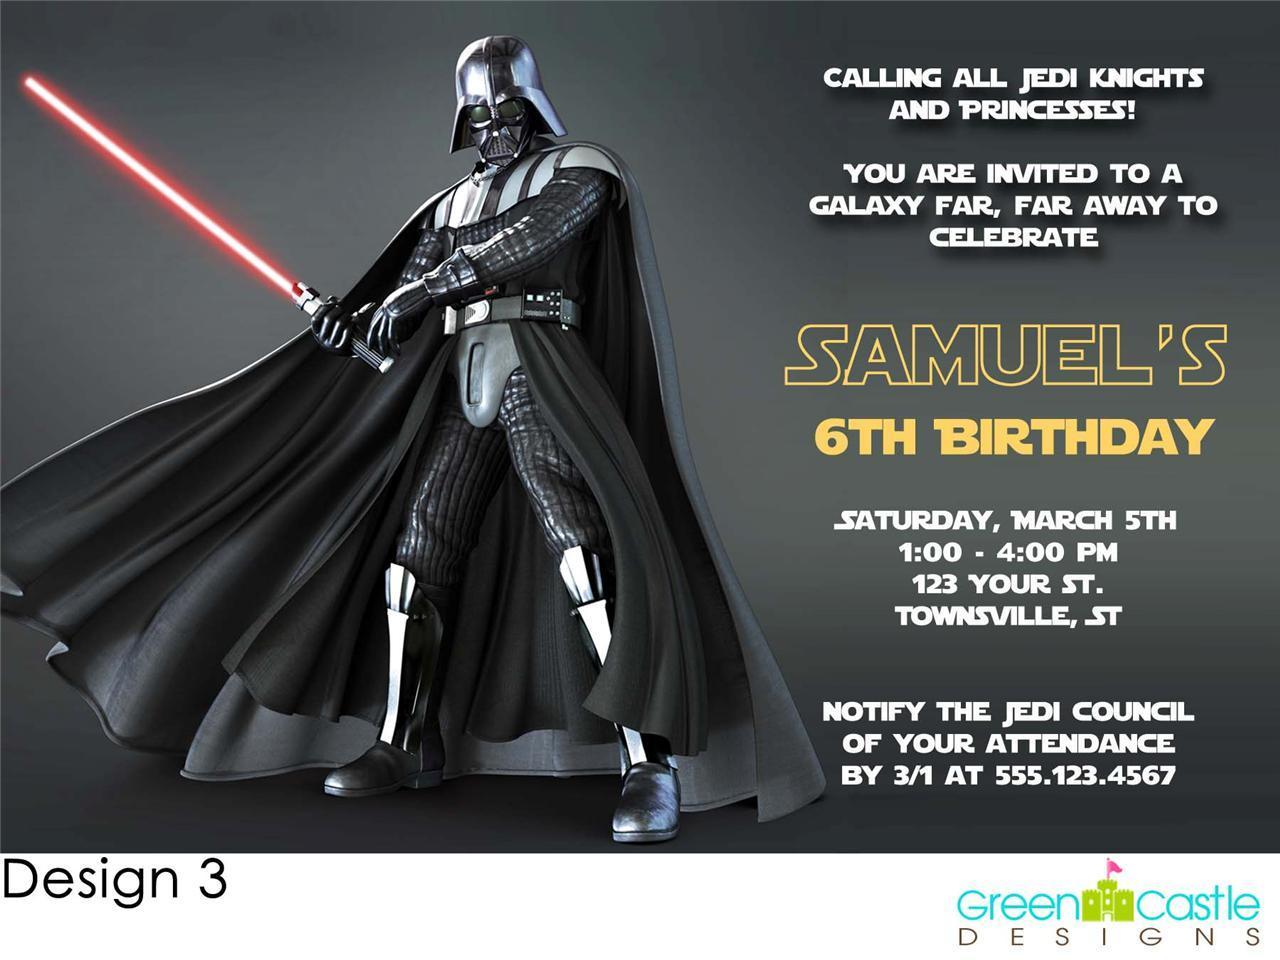 Star Wars Birthday Party Invitation Template